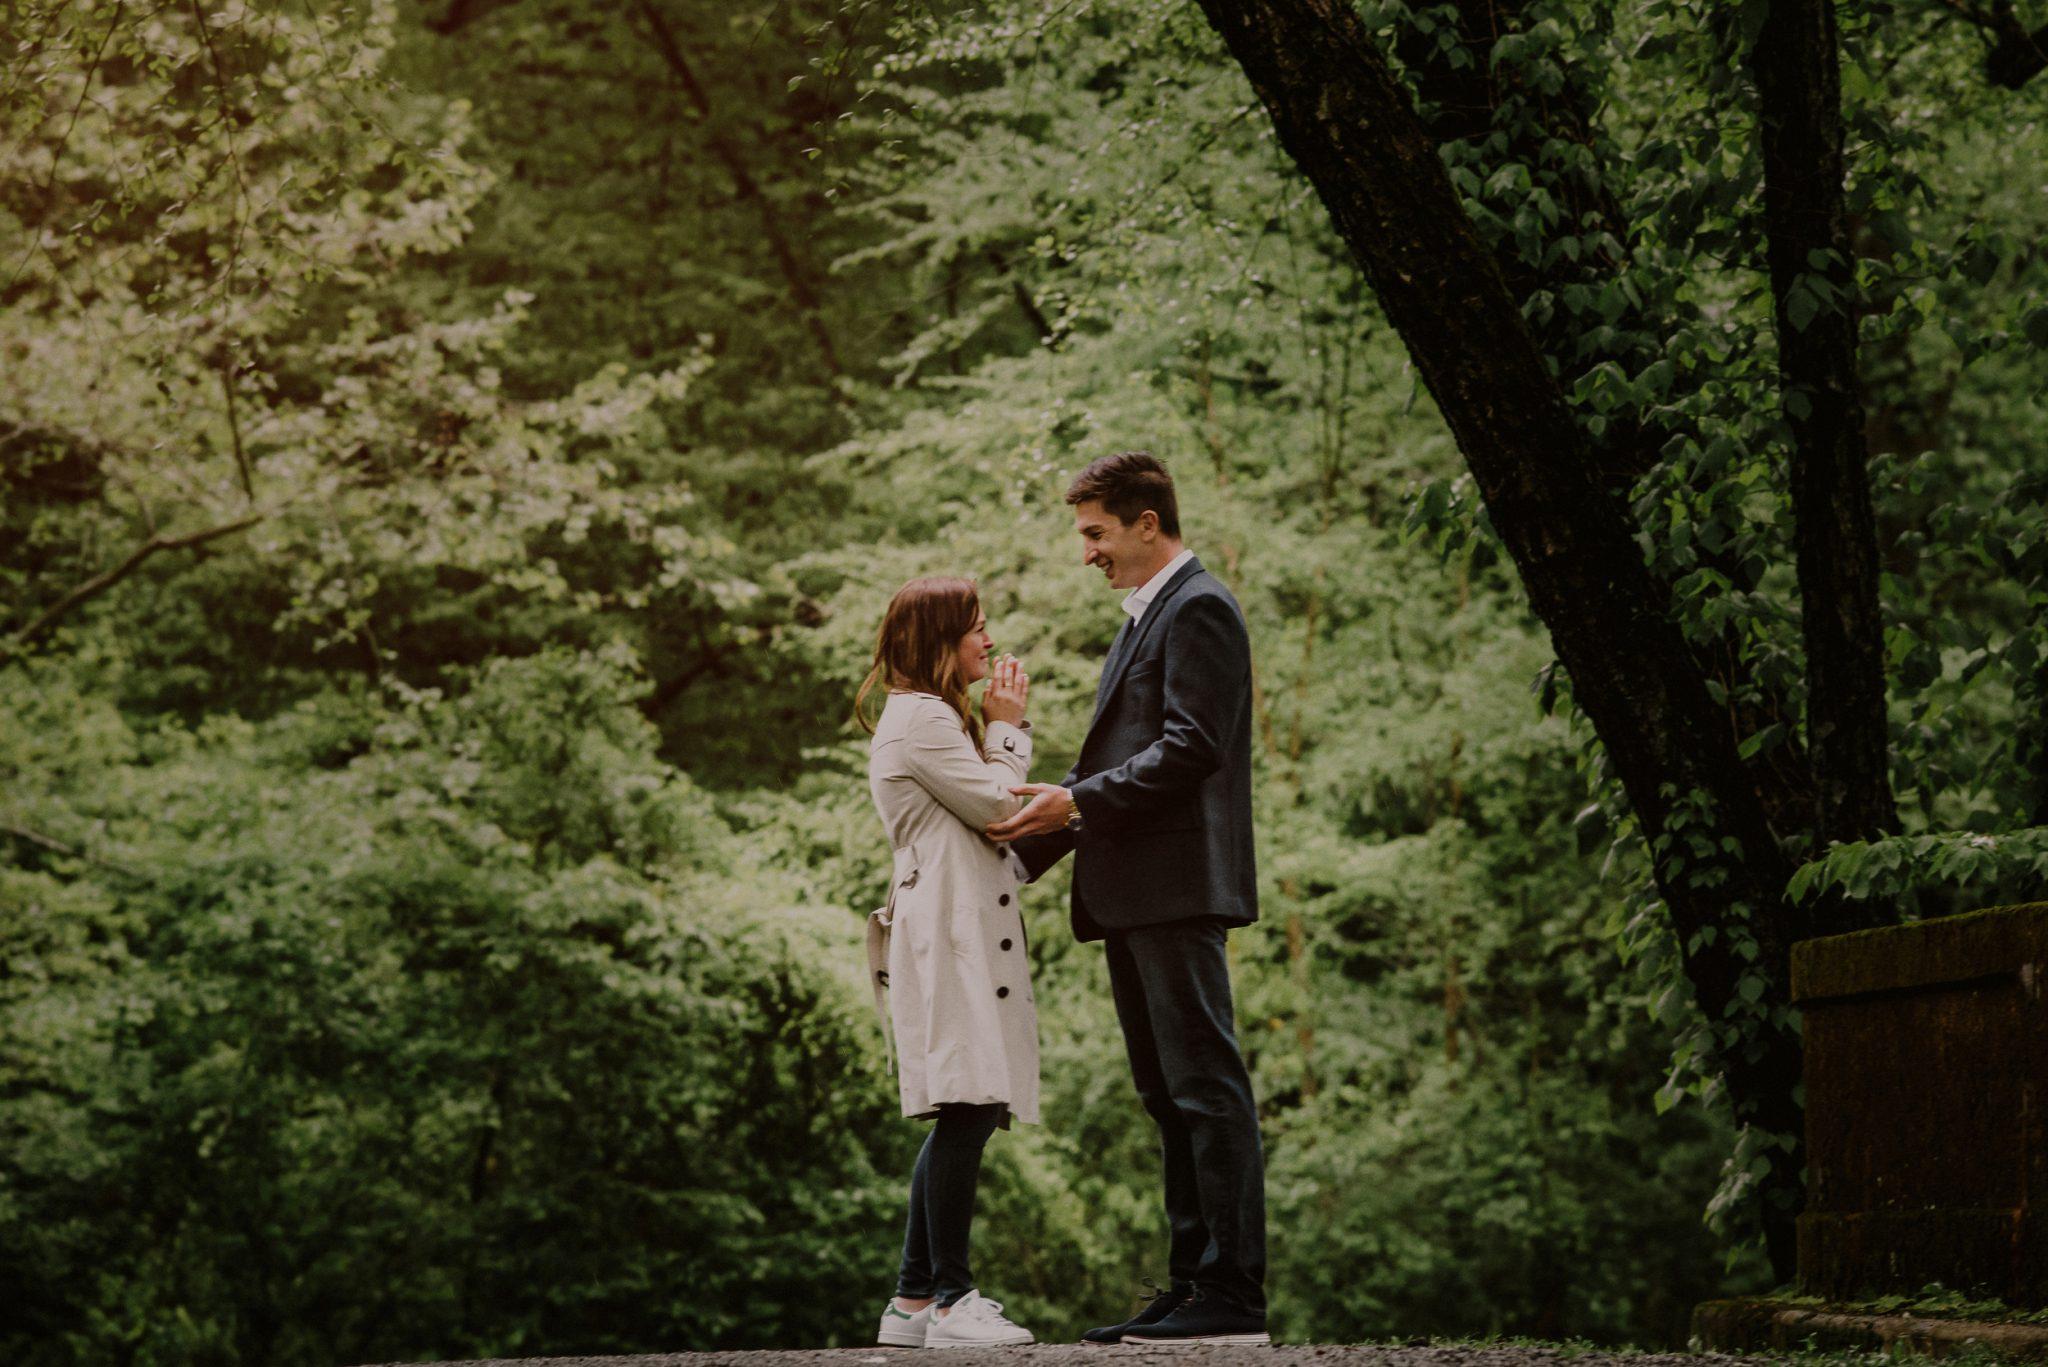 surprise proposal photography at Natirar park in gladstone NJ